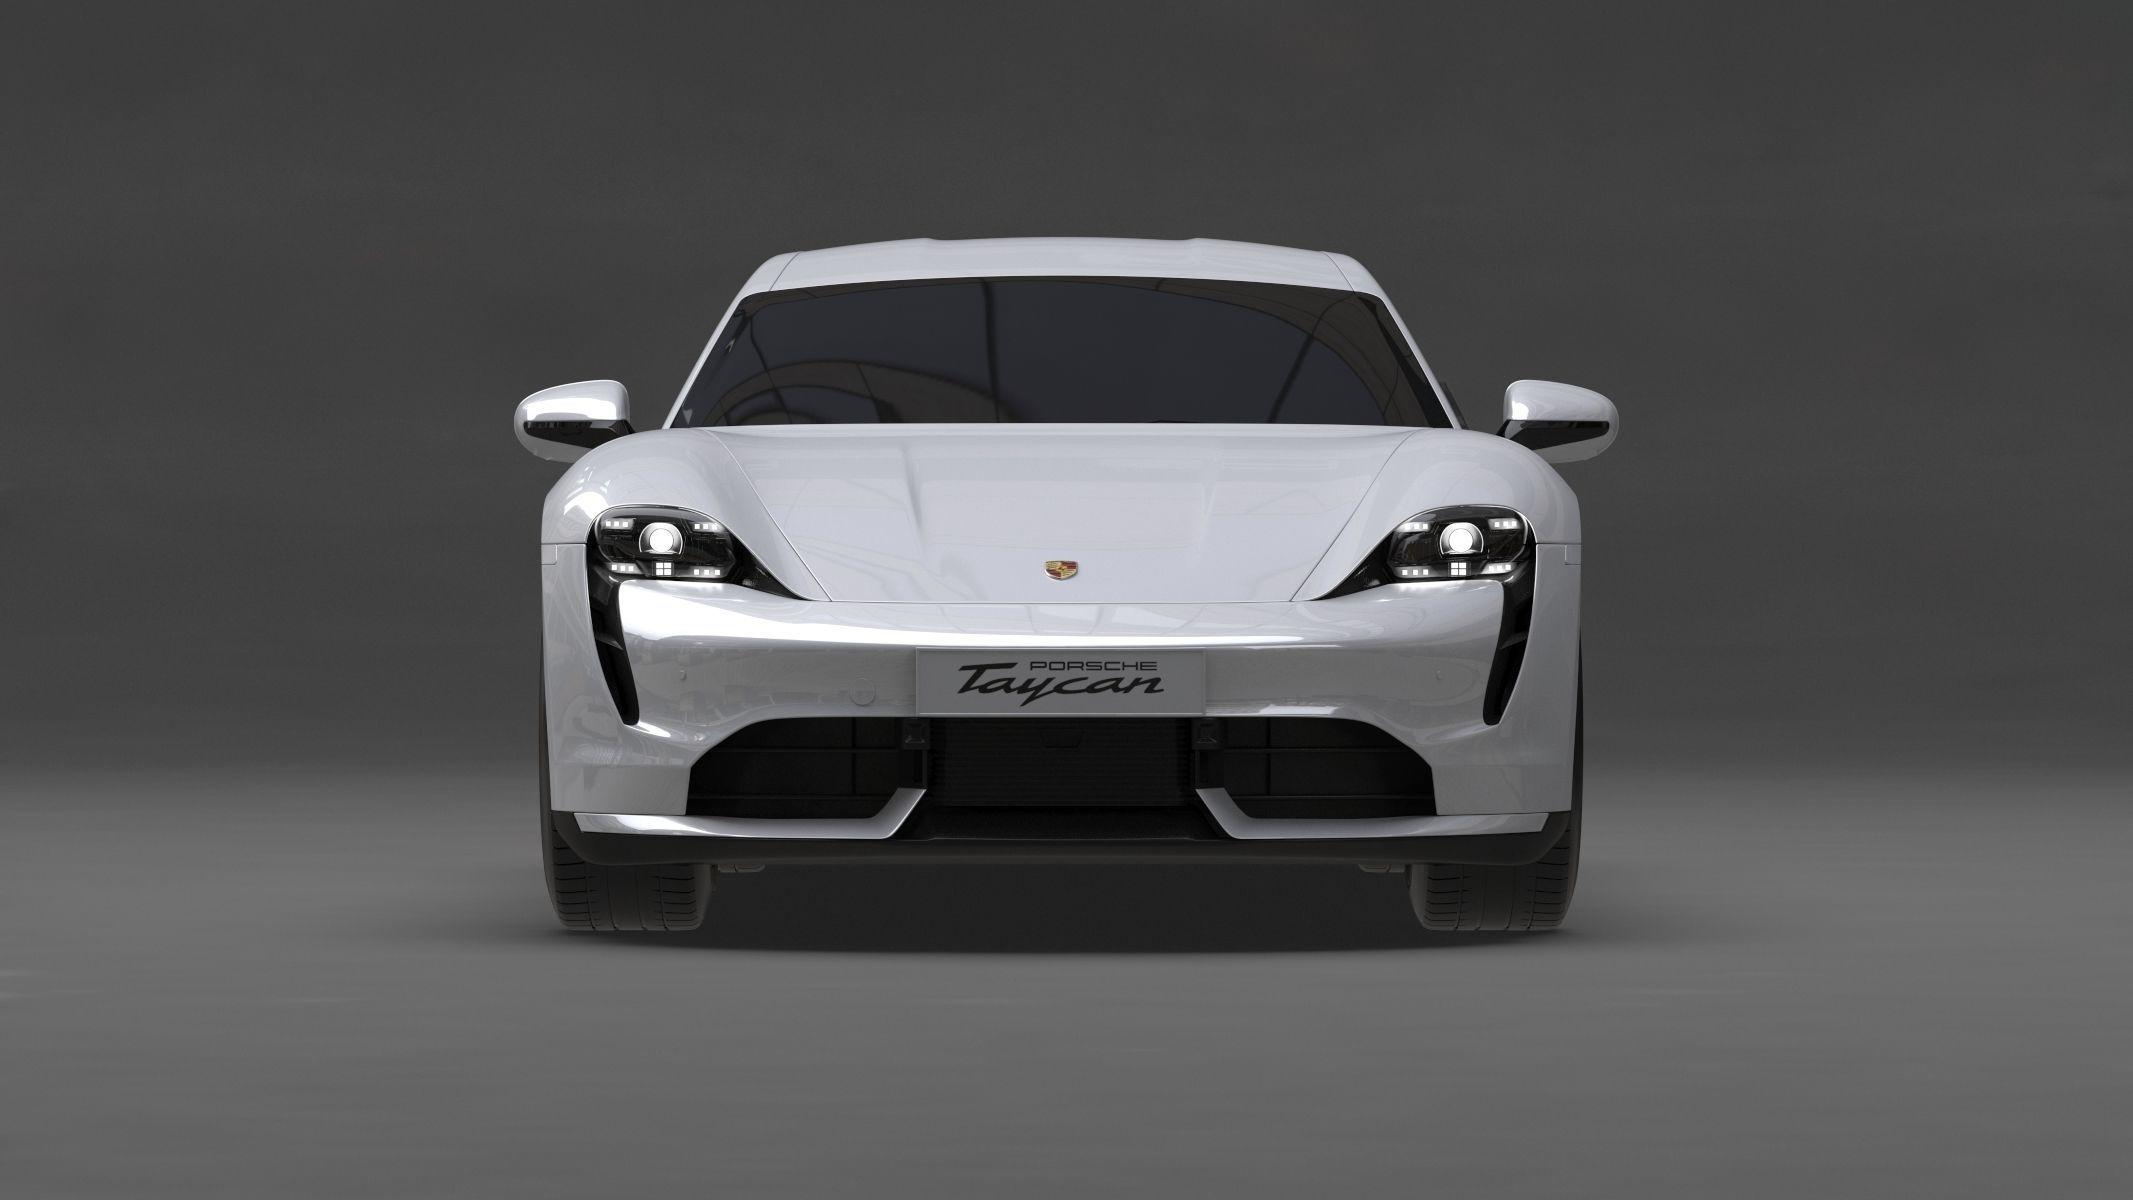 Porsche Taycan 2020 No Interior